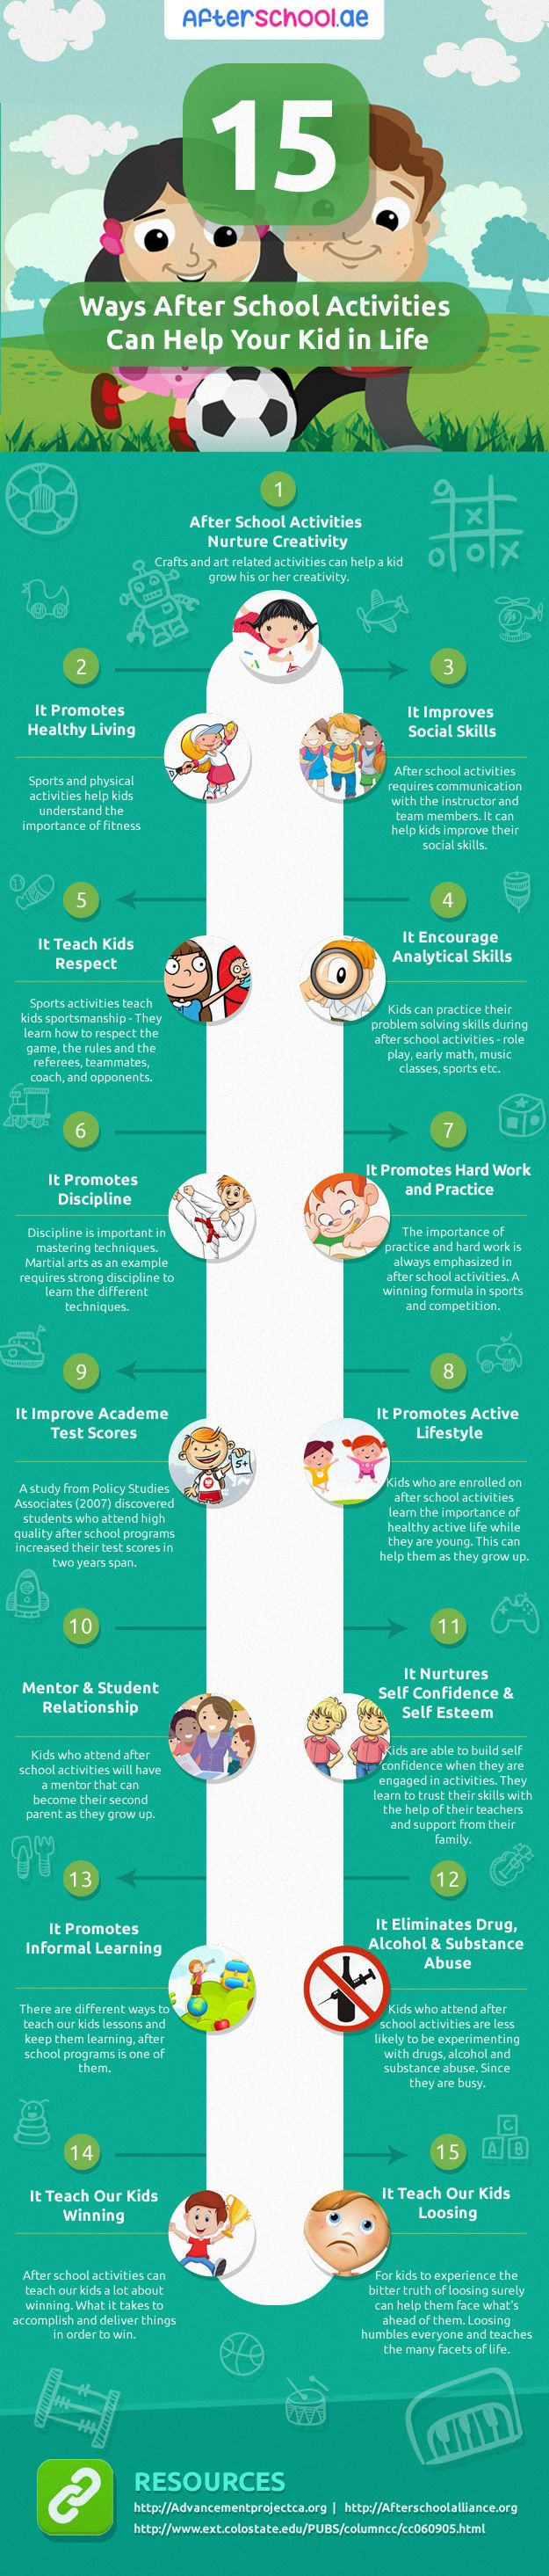 15 Ways After School Activities Can Help Kids Infographic - http://elearninginfographics.com/15-ways-after-school-activities-can-help-kids-infographic/